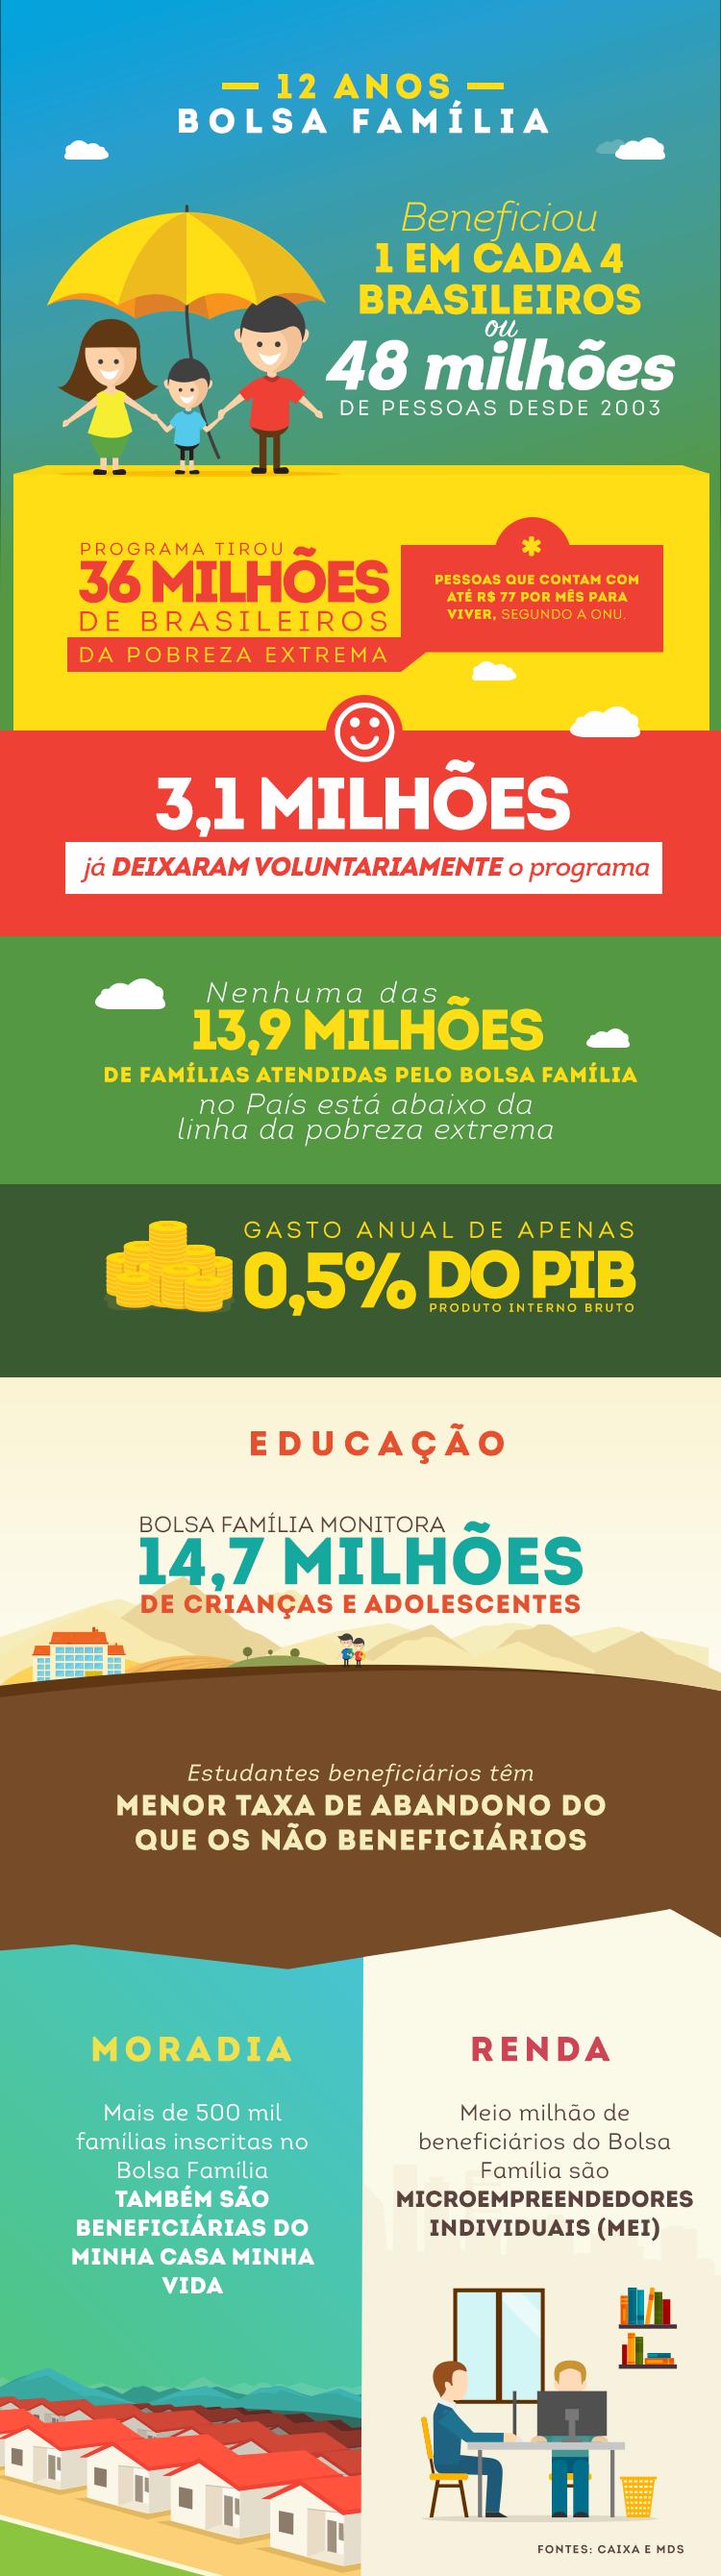 info_bolsafamilia